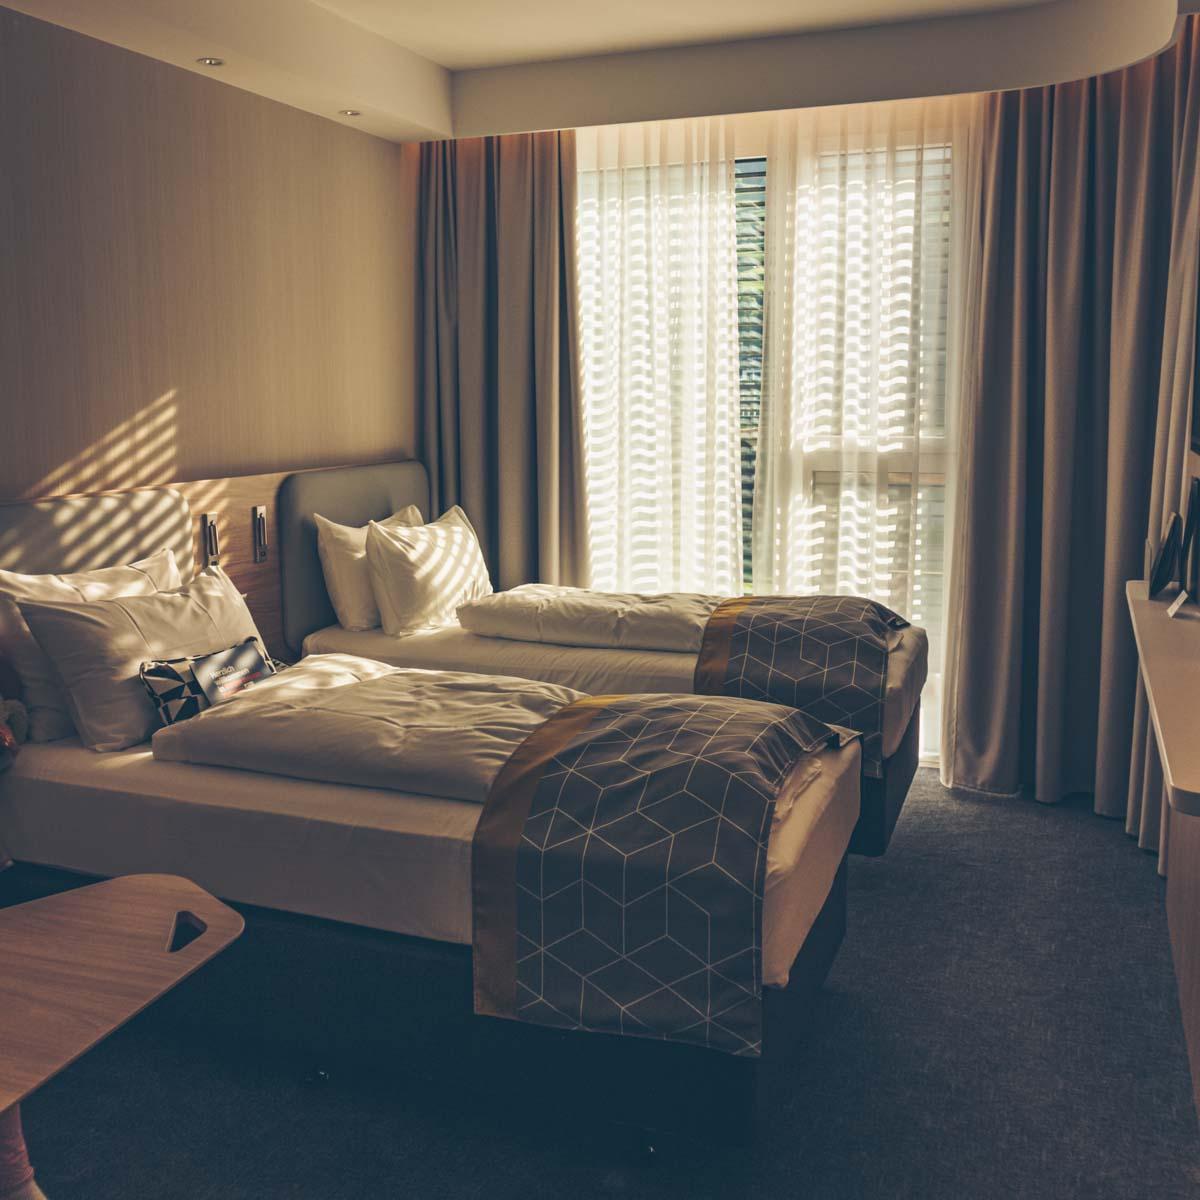 Holiday Inn Express in Luzern-Kriens